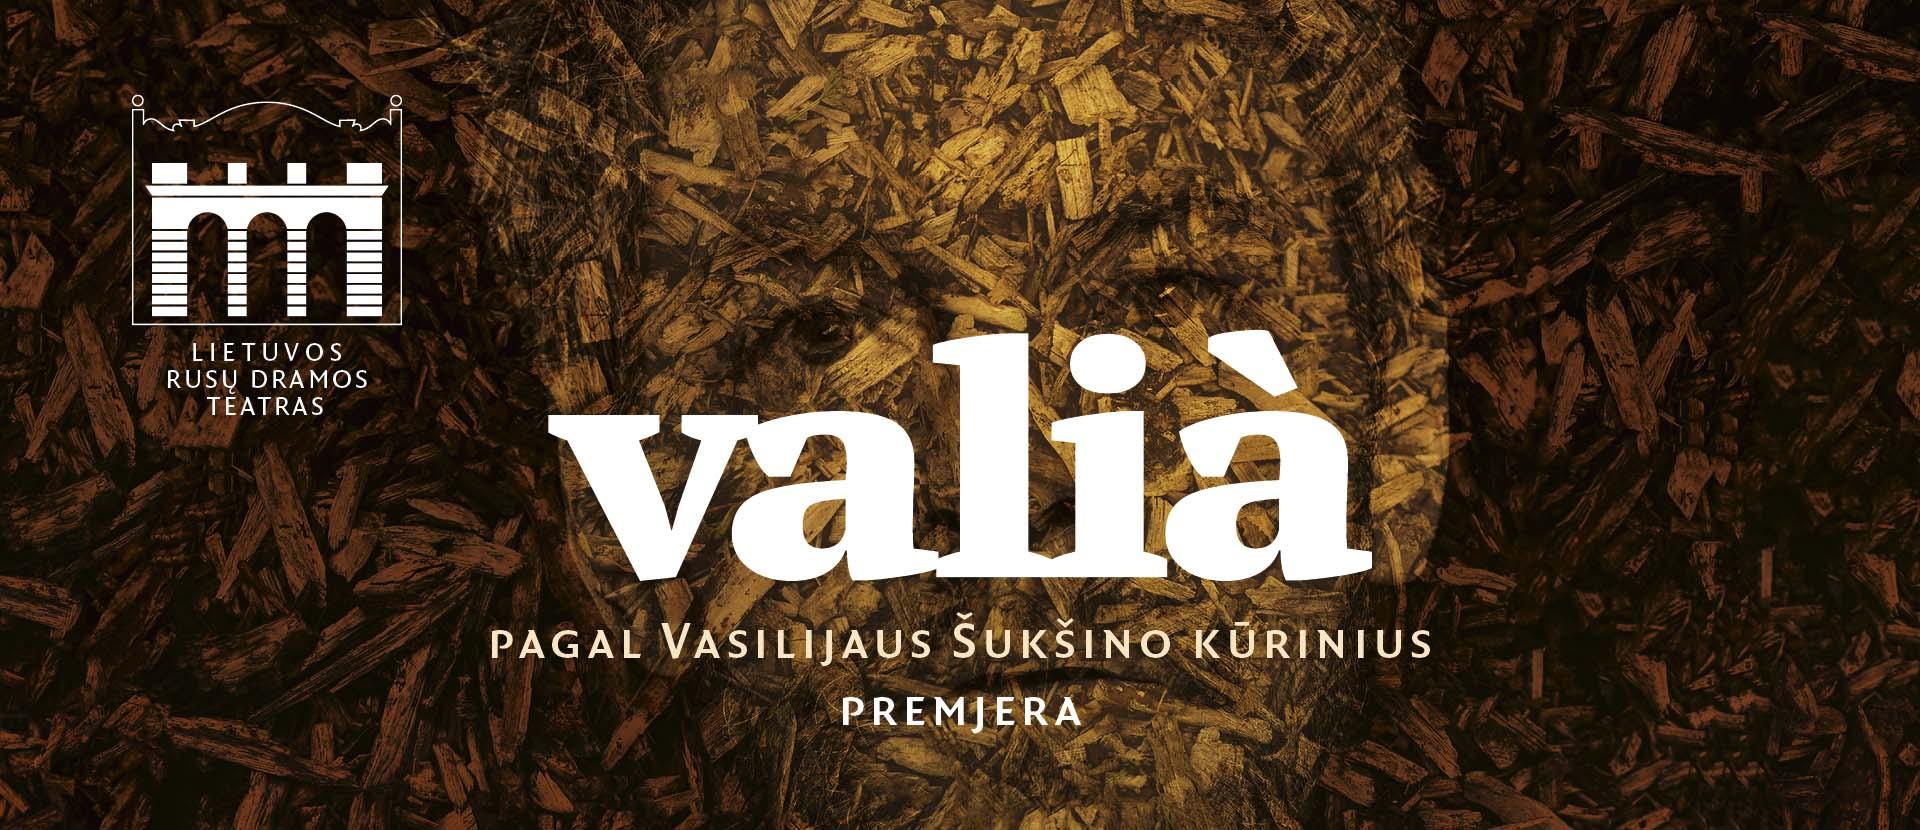 Premjera Pagal Vasilijaus Šukšino kūrybą VALIA     Rež. Vladimiras Gurfinkelis